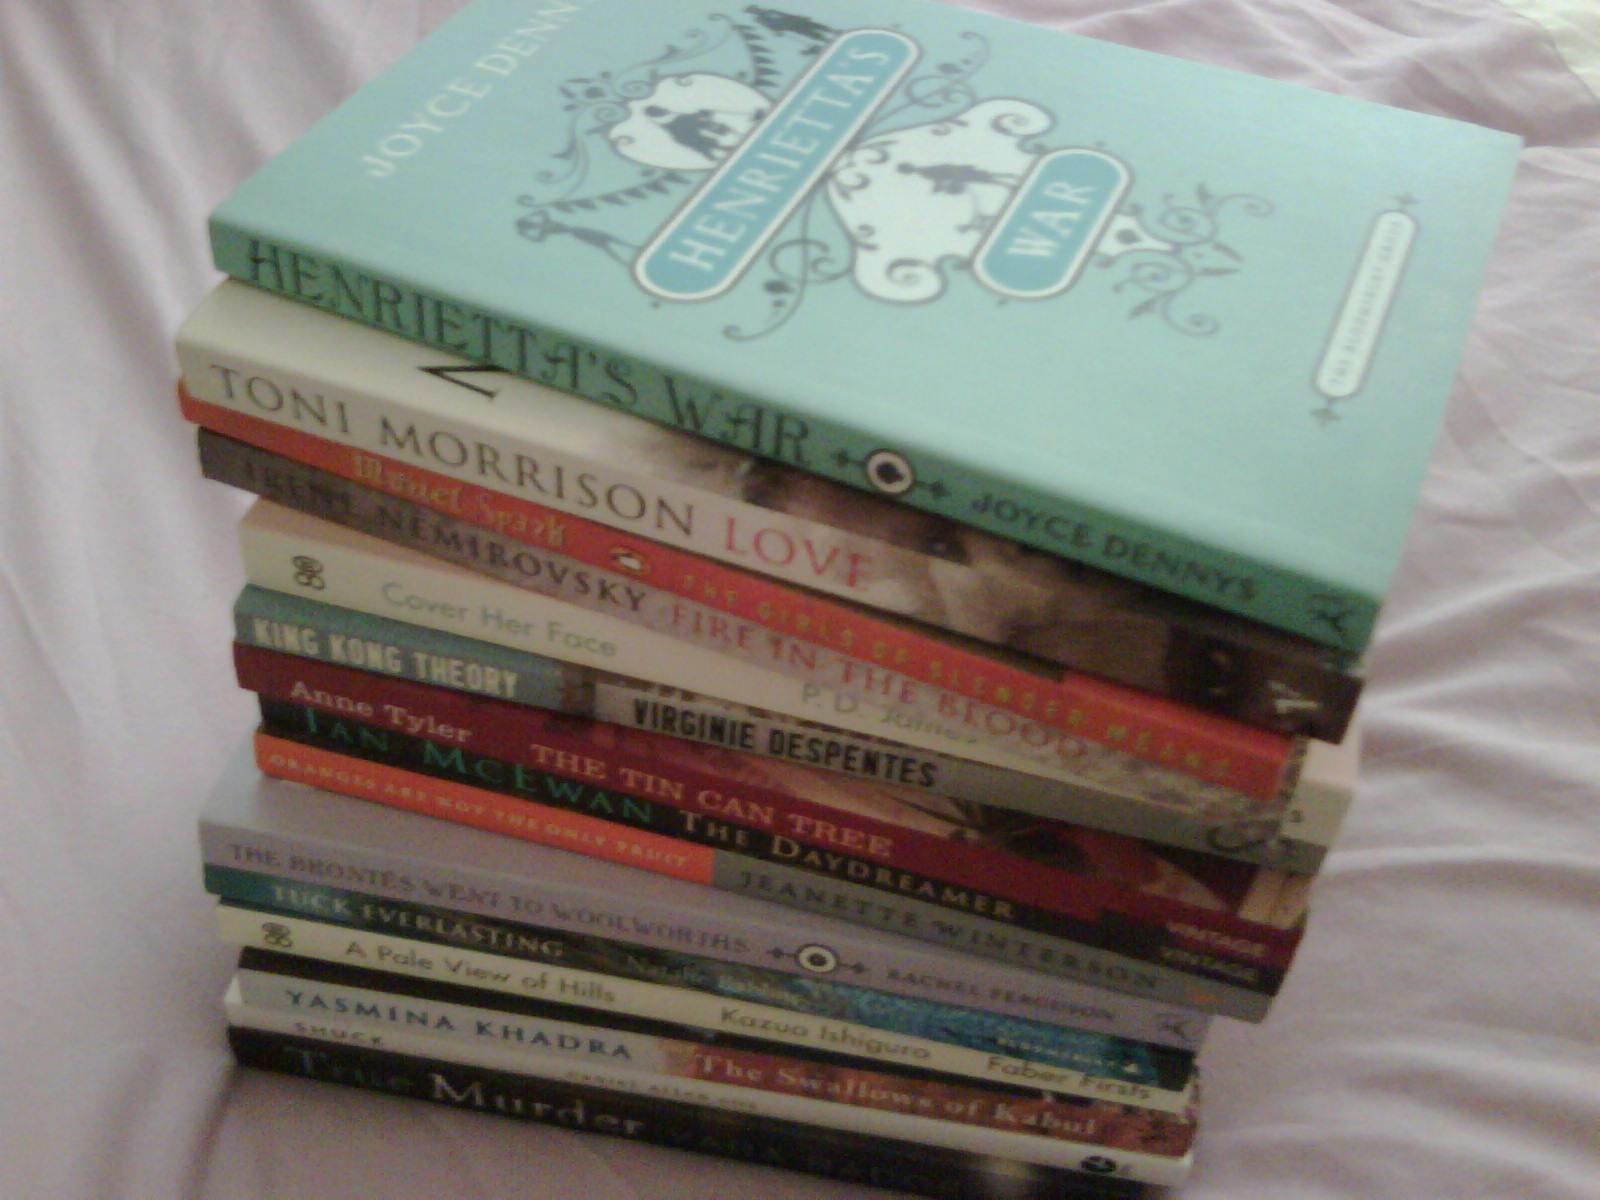 A few short novels...